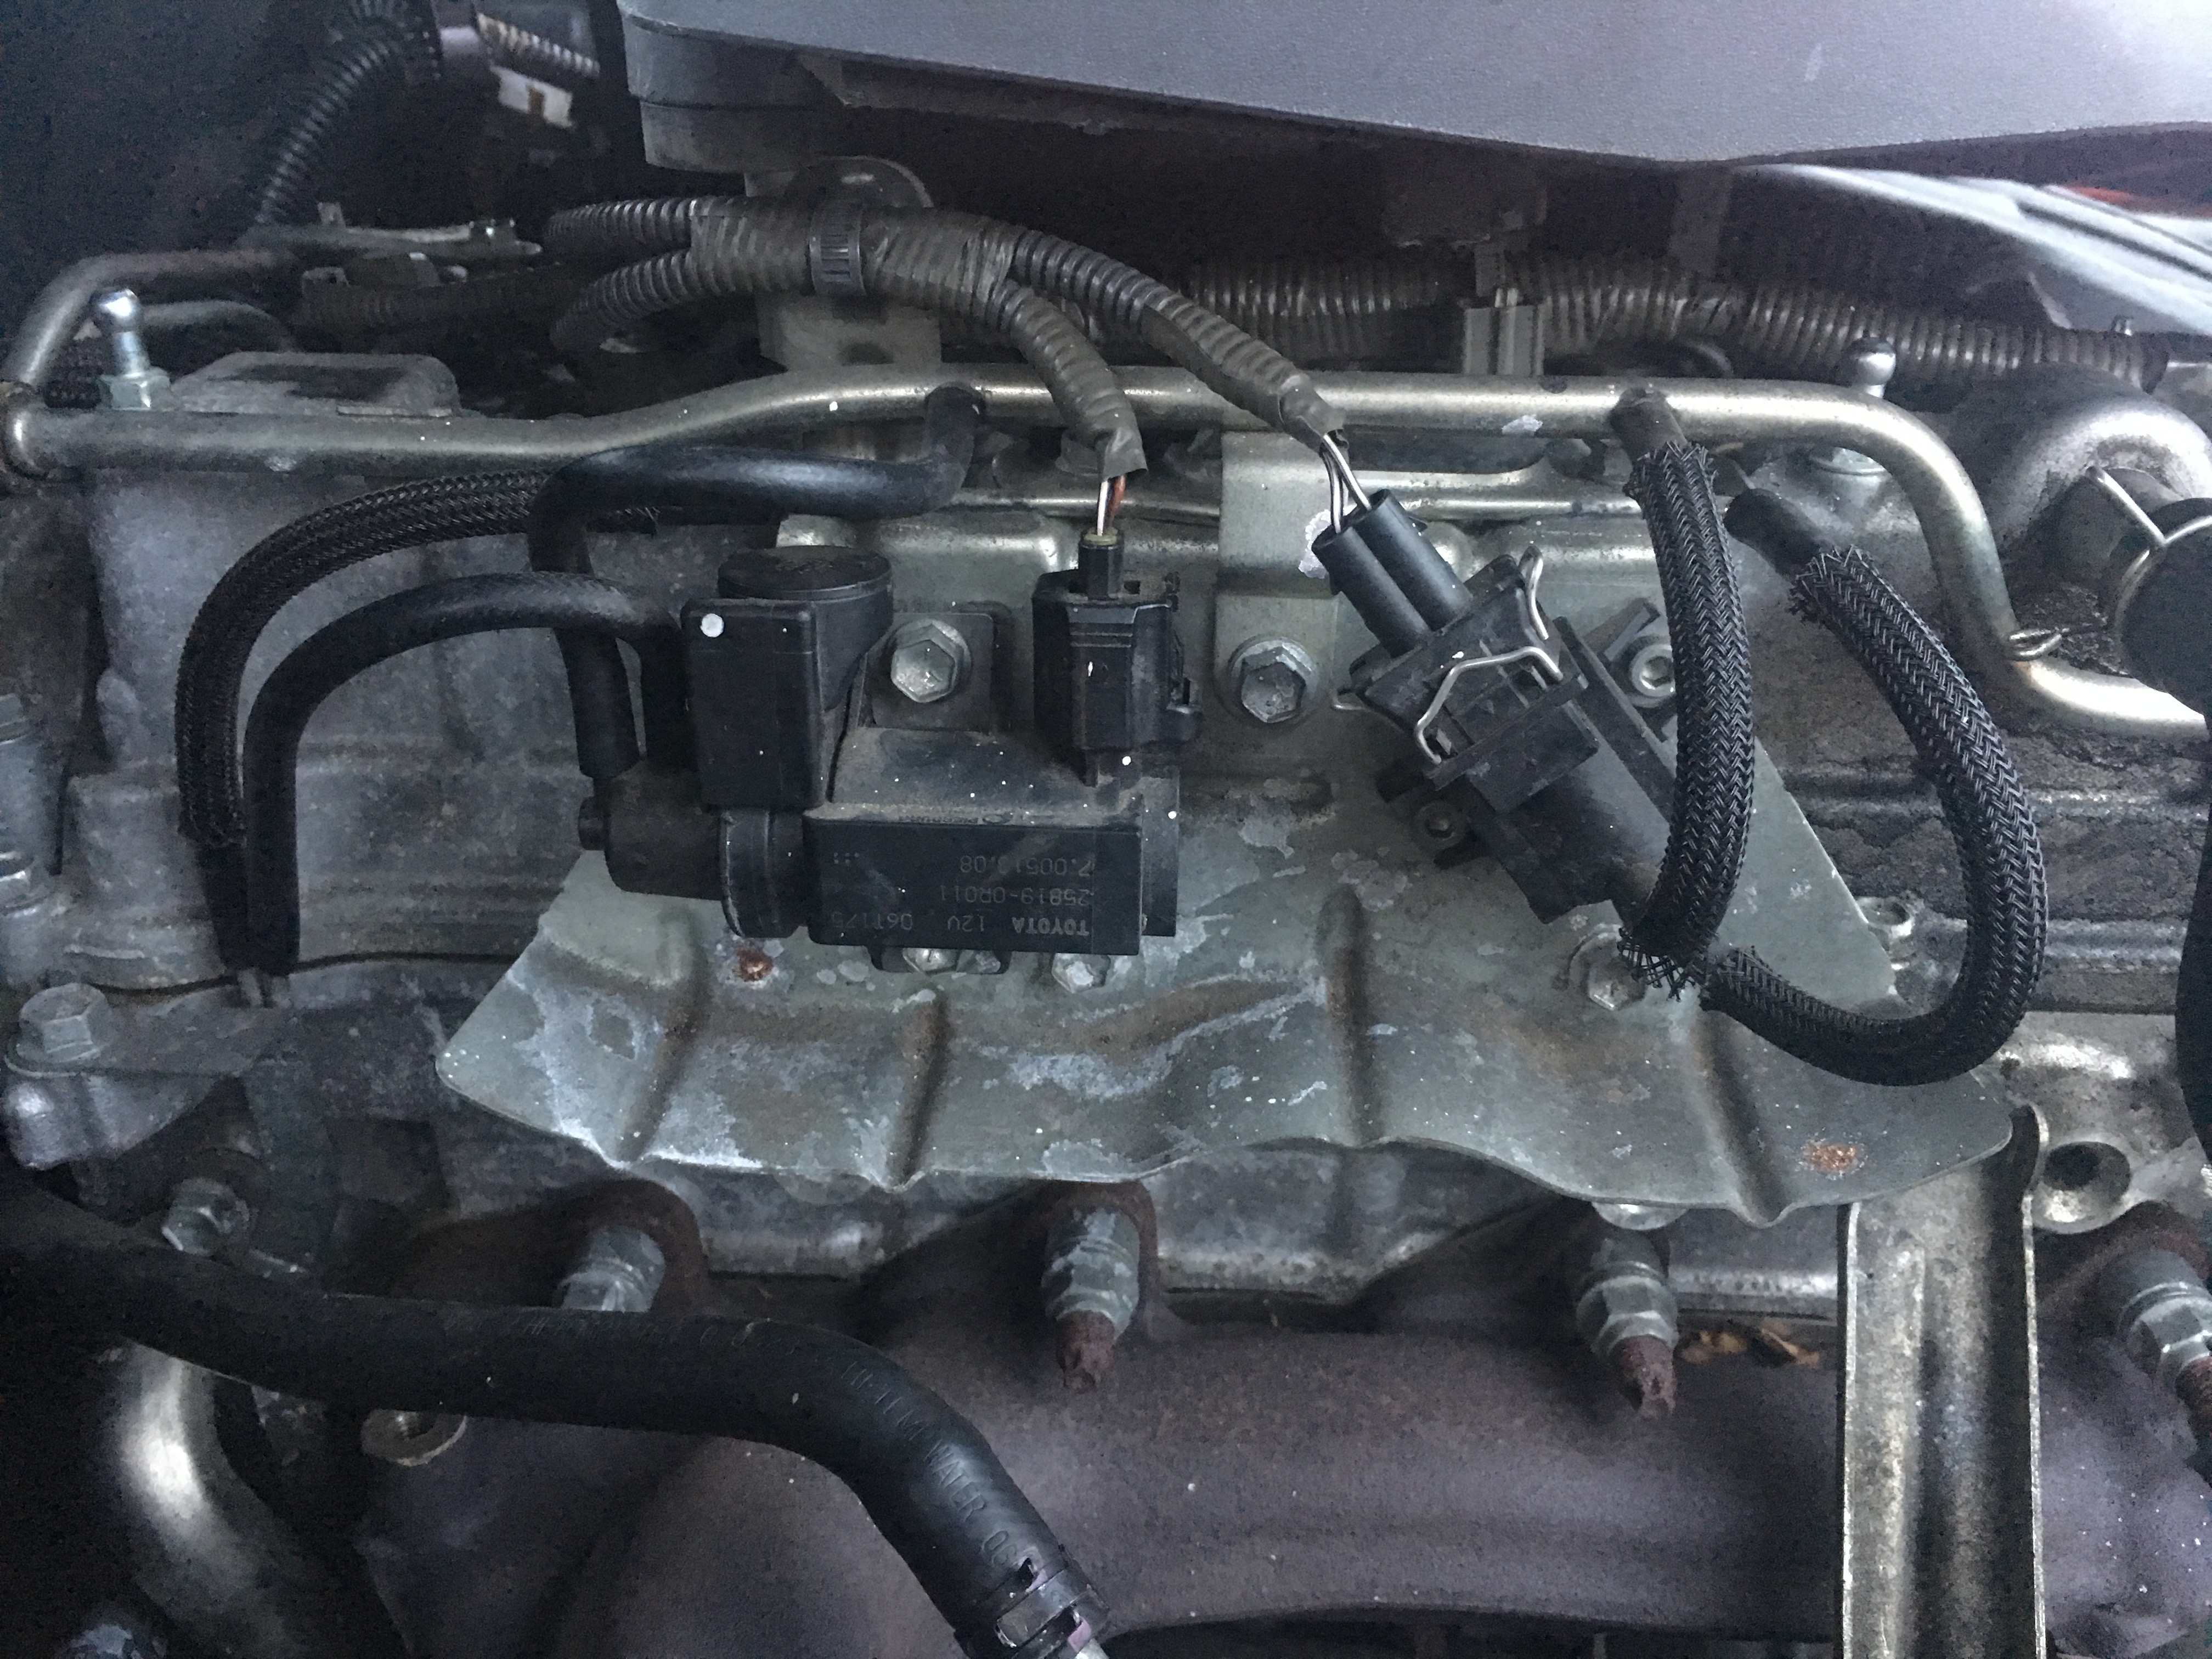 IS220d strange problem, possibly turbo? - Lexus IS 250 / Lexus IS